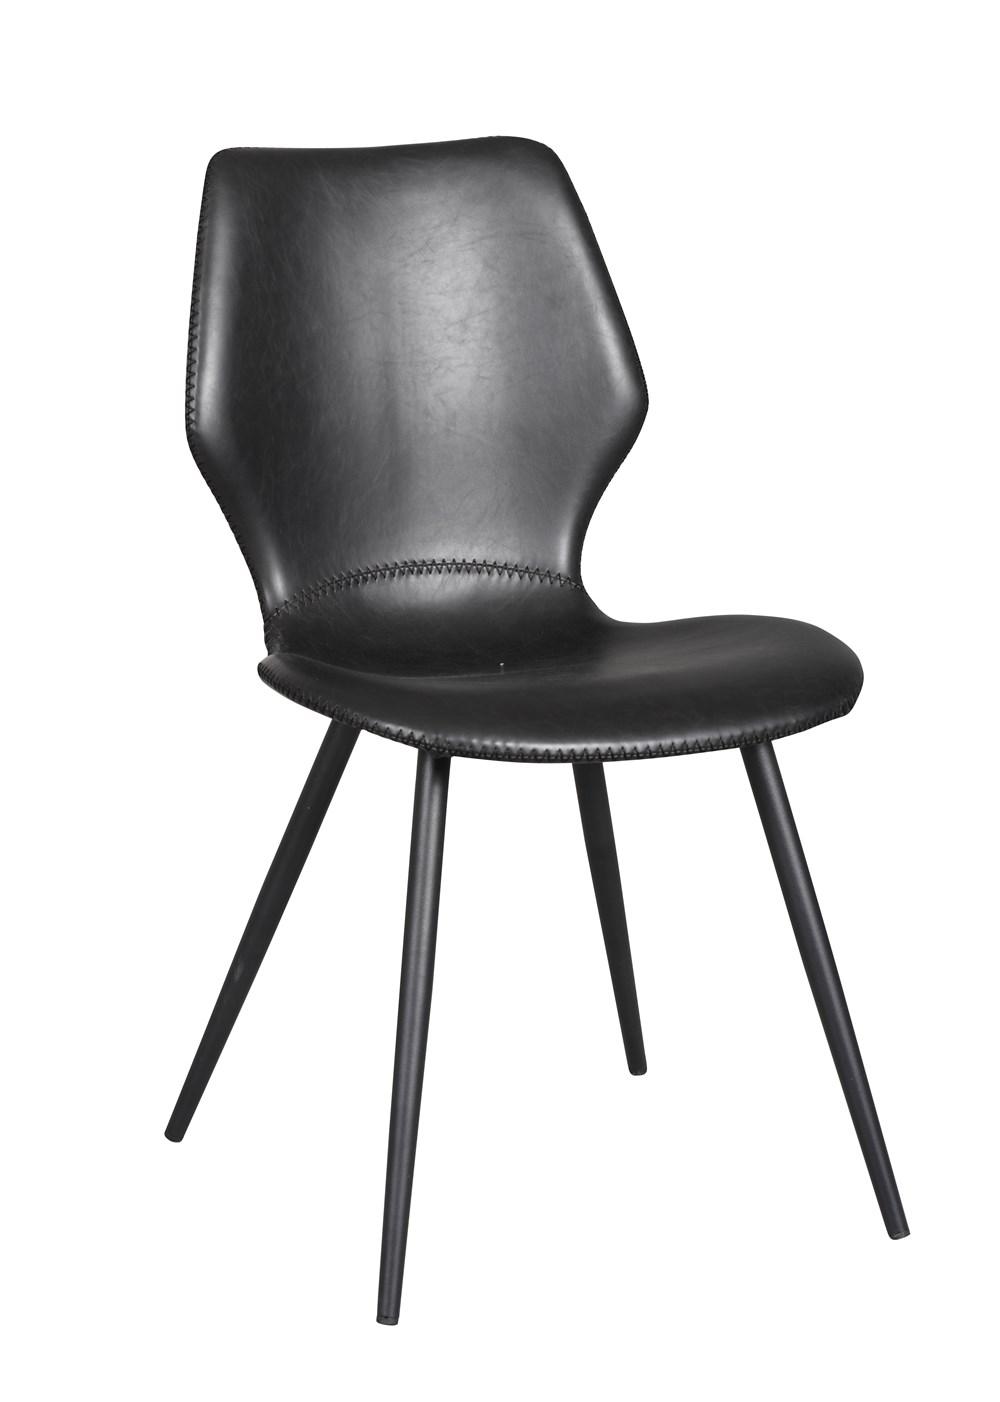 Highrock tuoli musta, Rowico